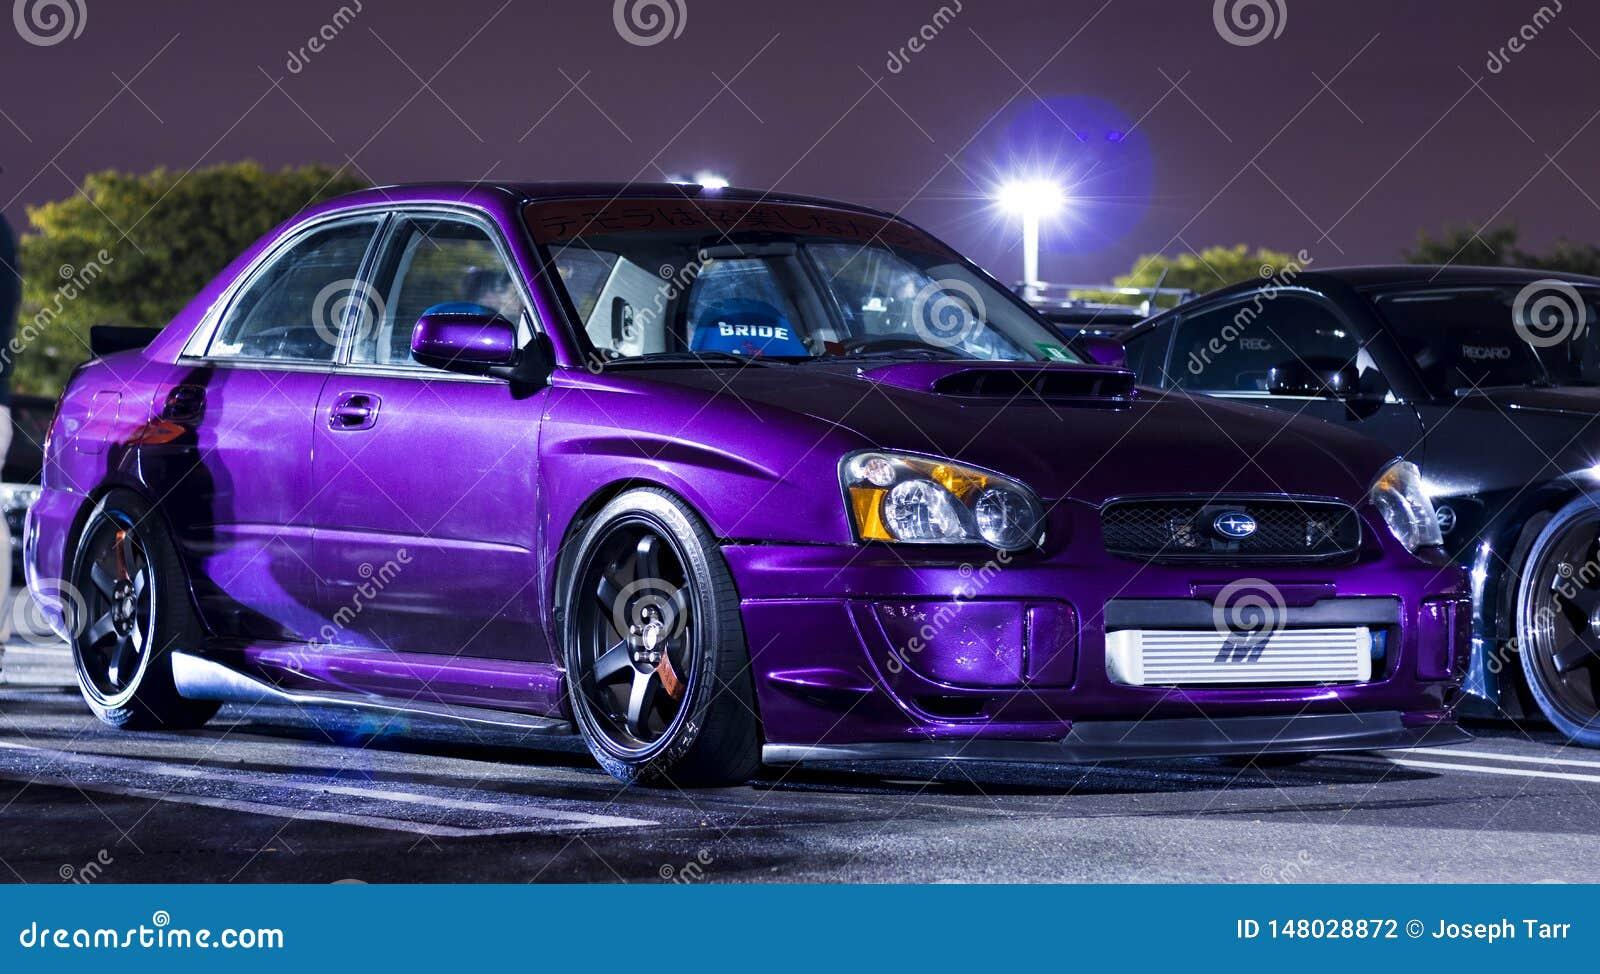 Metallic Purple Customized Subaru WRX STI